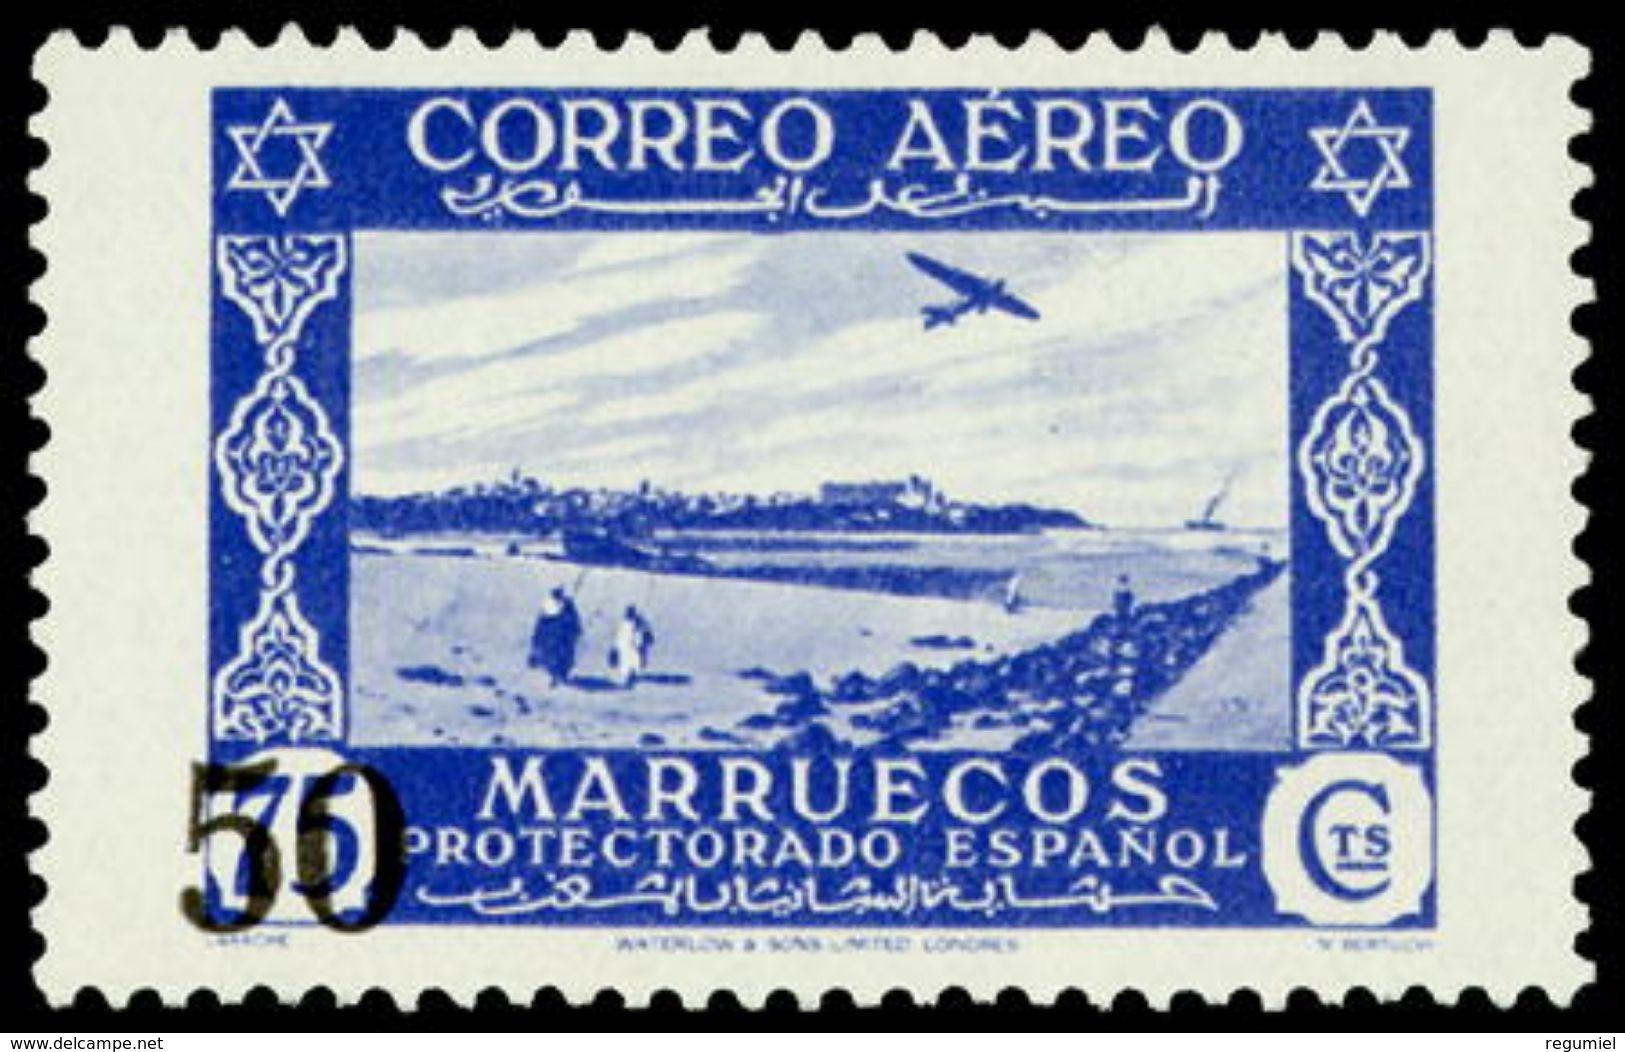 Marruecos 373 * Paisajes. 1953 Charnela - Spanisch-Marokko